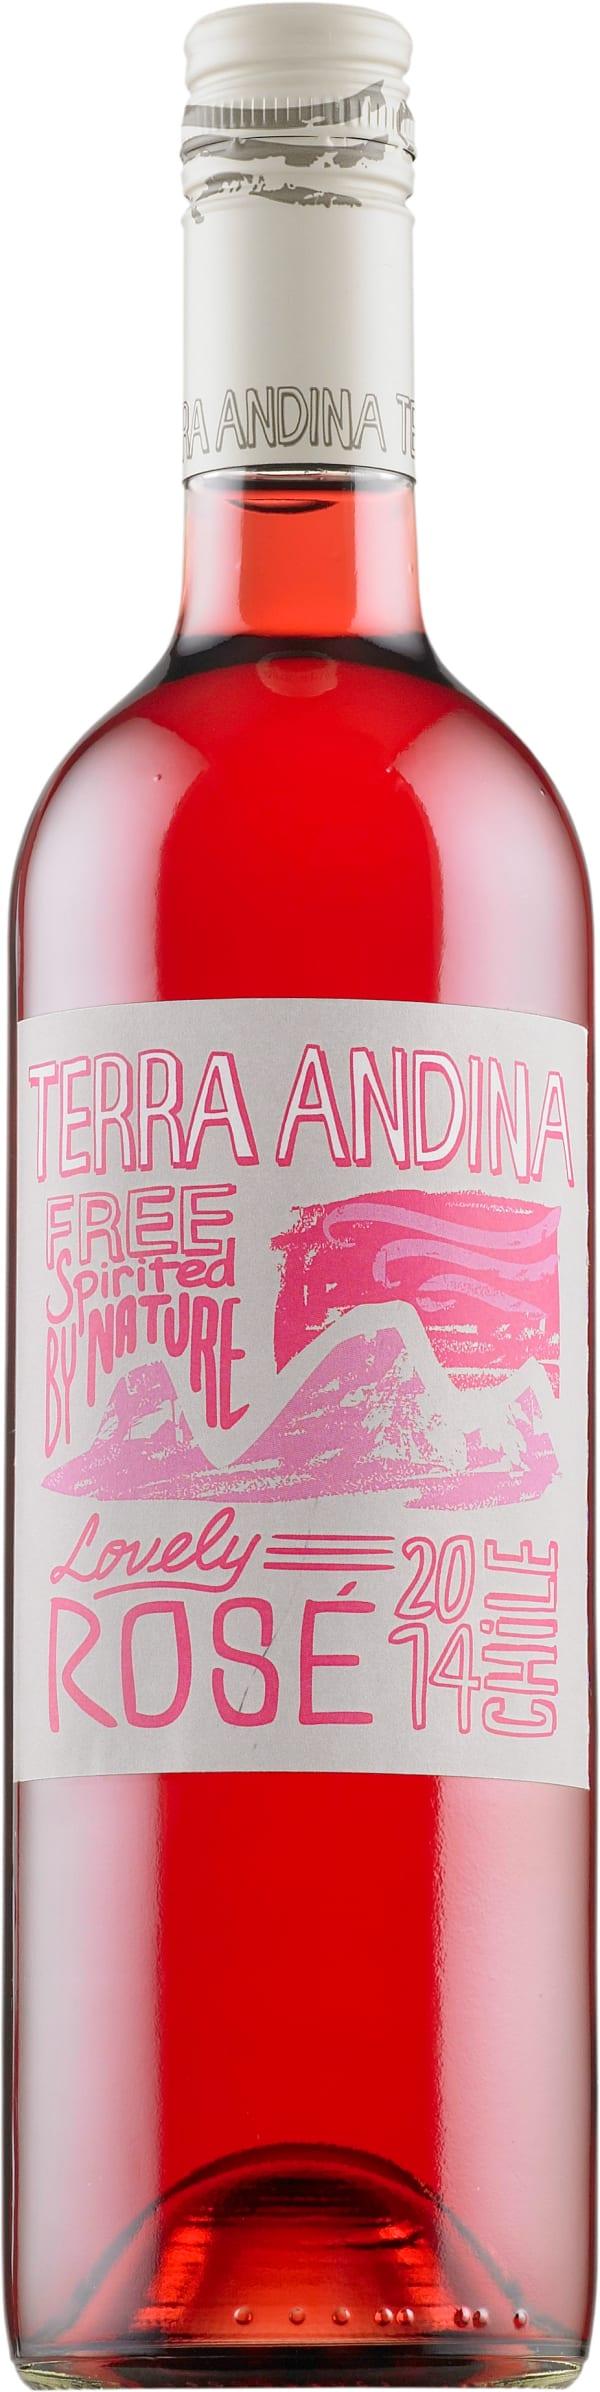 Terra Andina Lovely Rosé 2018